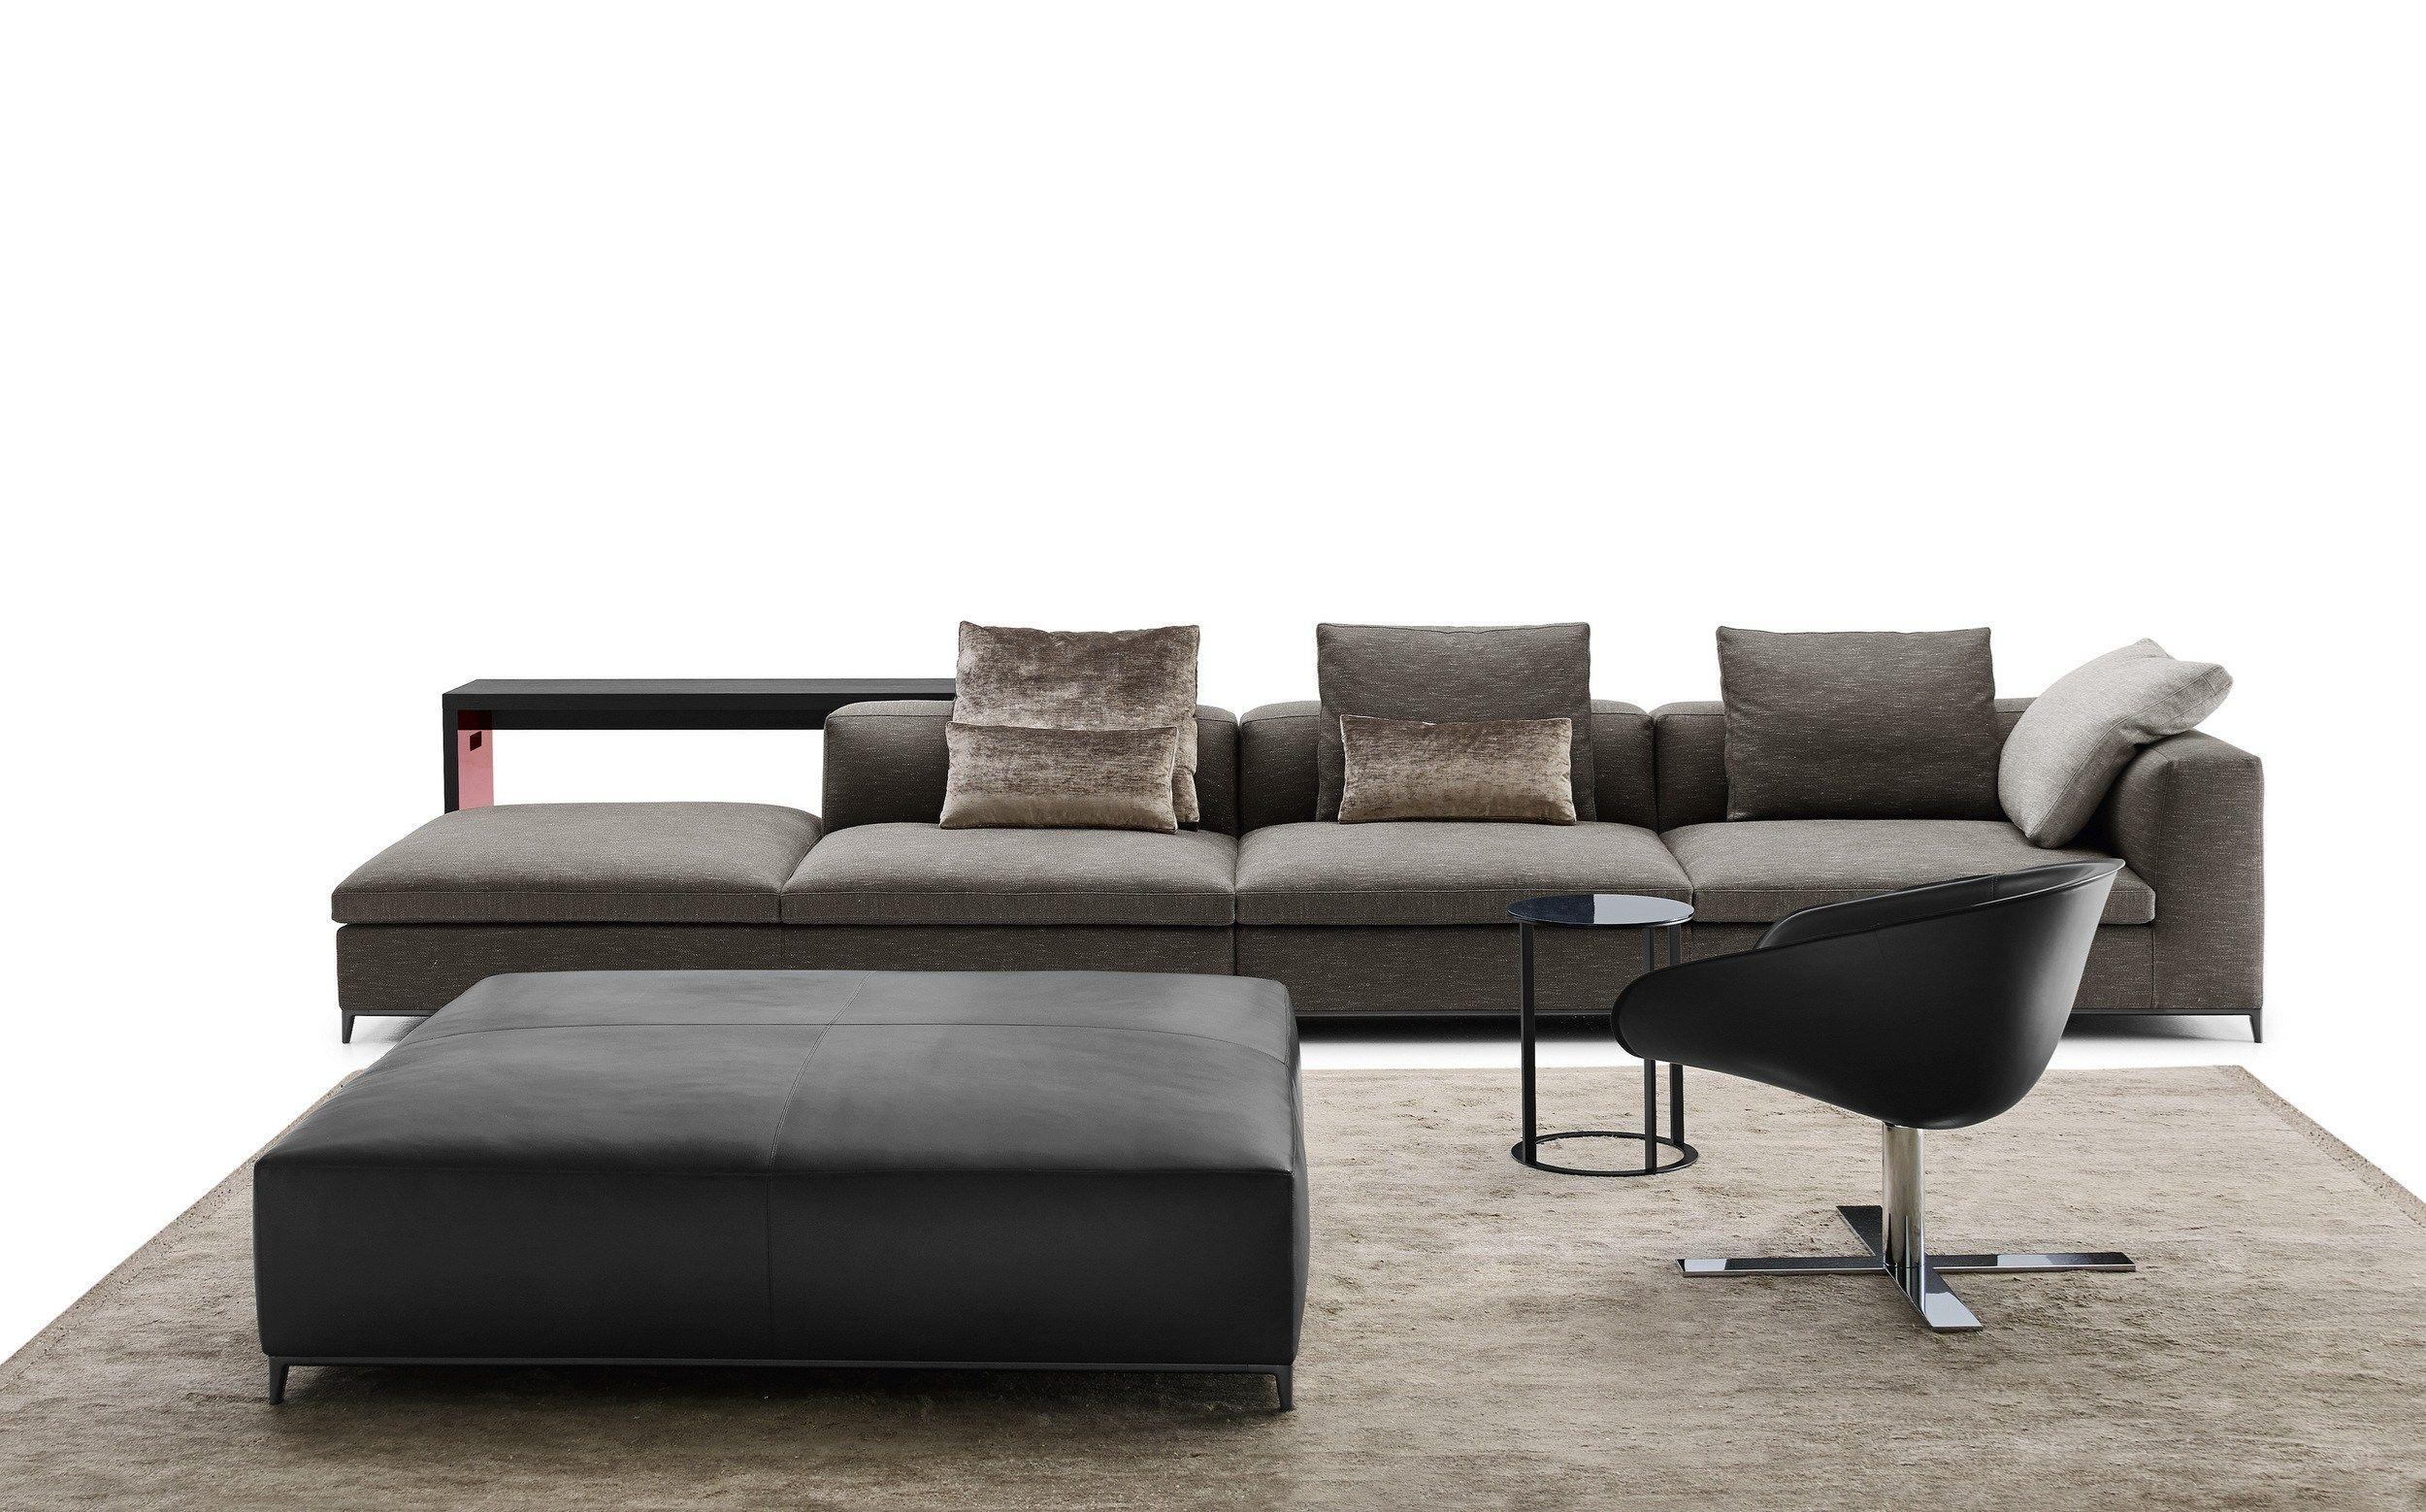 Corner sectional fabric sofa MICHEL CLUB by B&B Italia